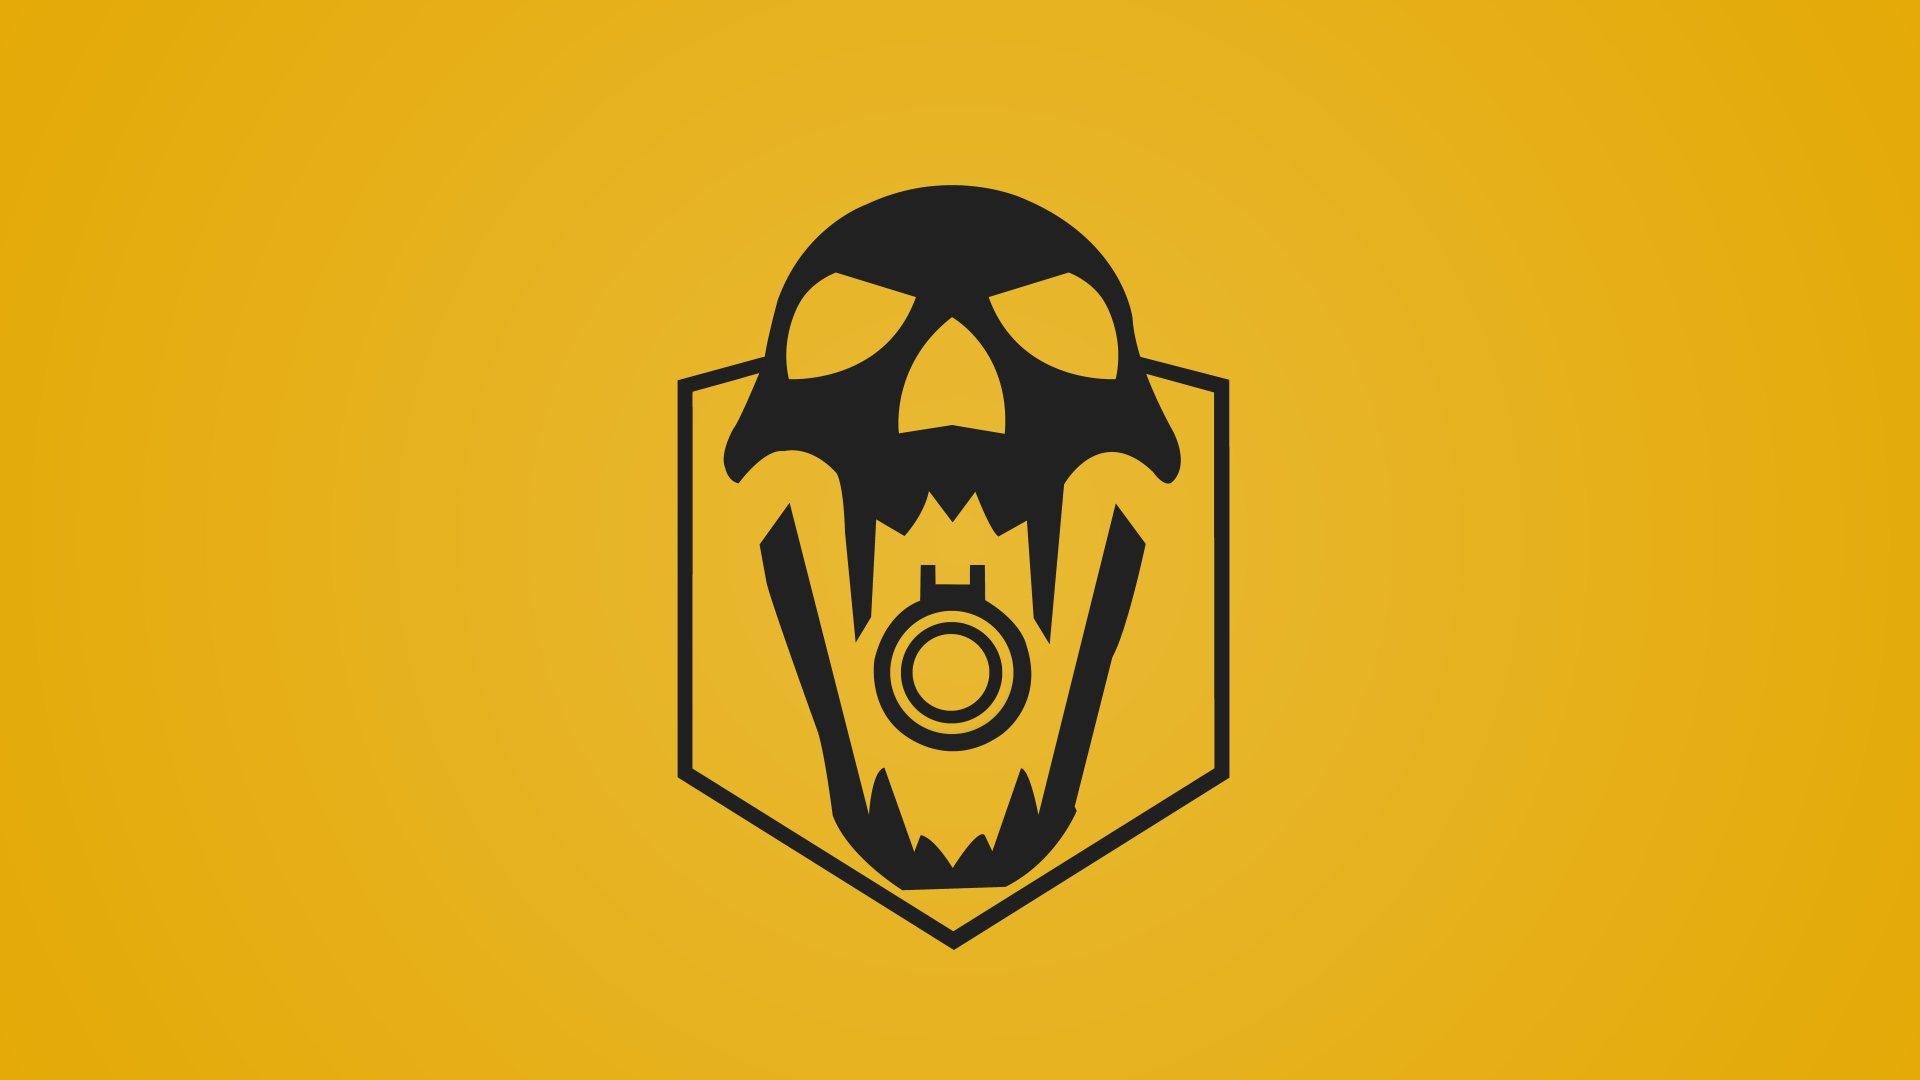 Video Game - Tom Clancy's Rainbow Six: Siege  Blackbeard (Tom Clancy's Rainbow Six: Siege) Yellow Operation Dust Line Skull Minimalist Wallpaper